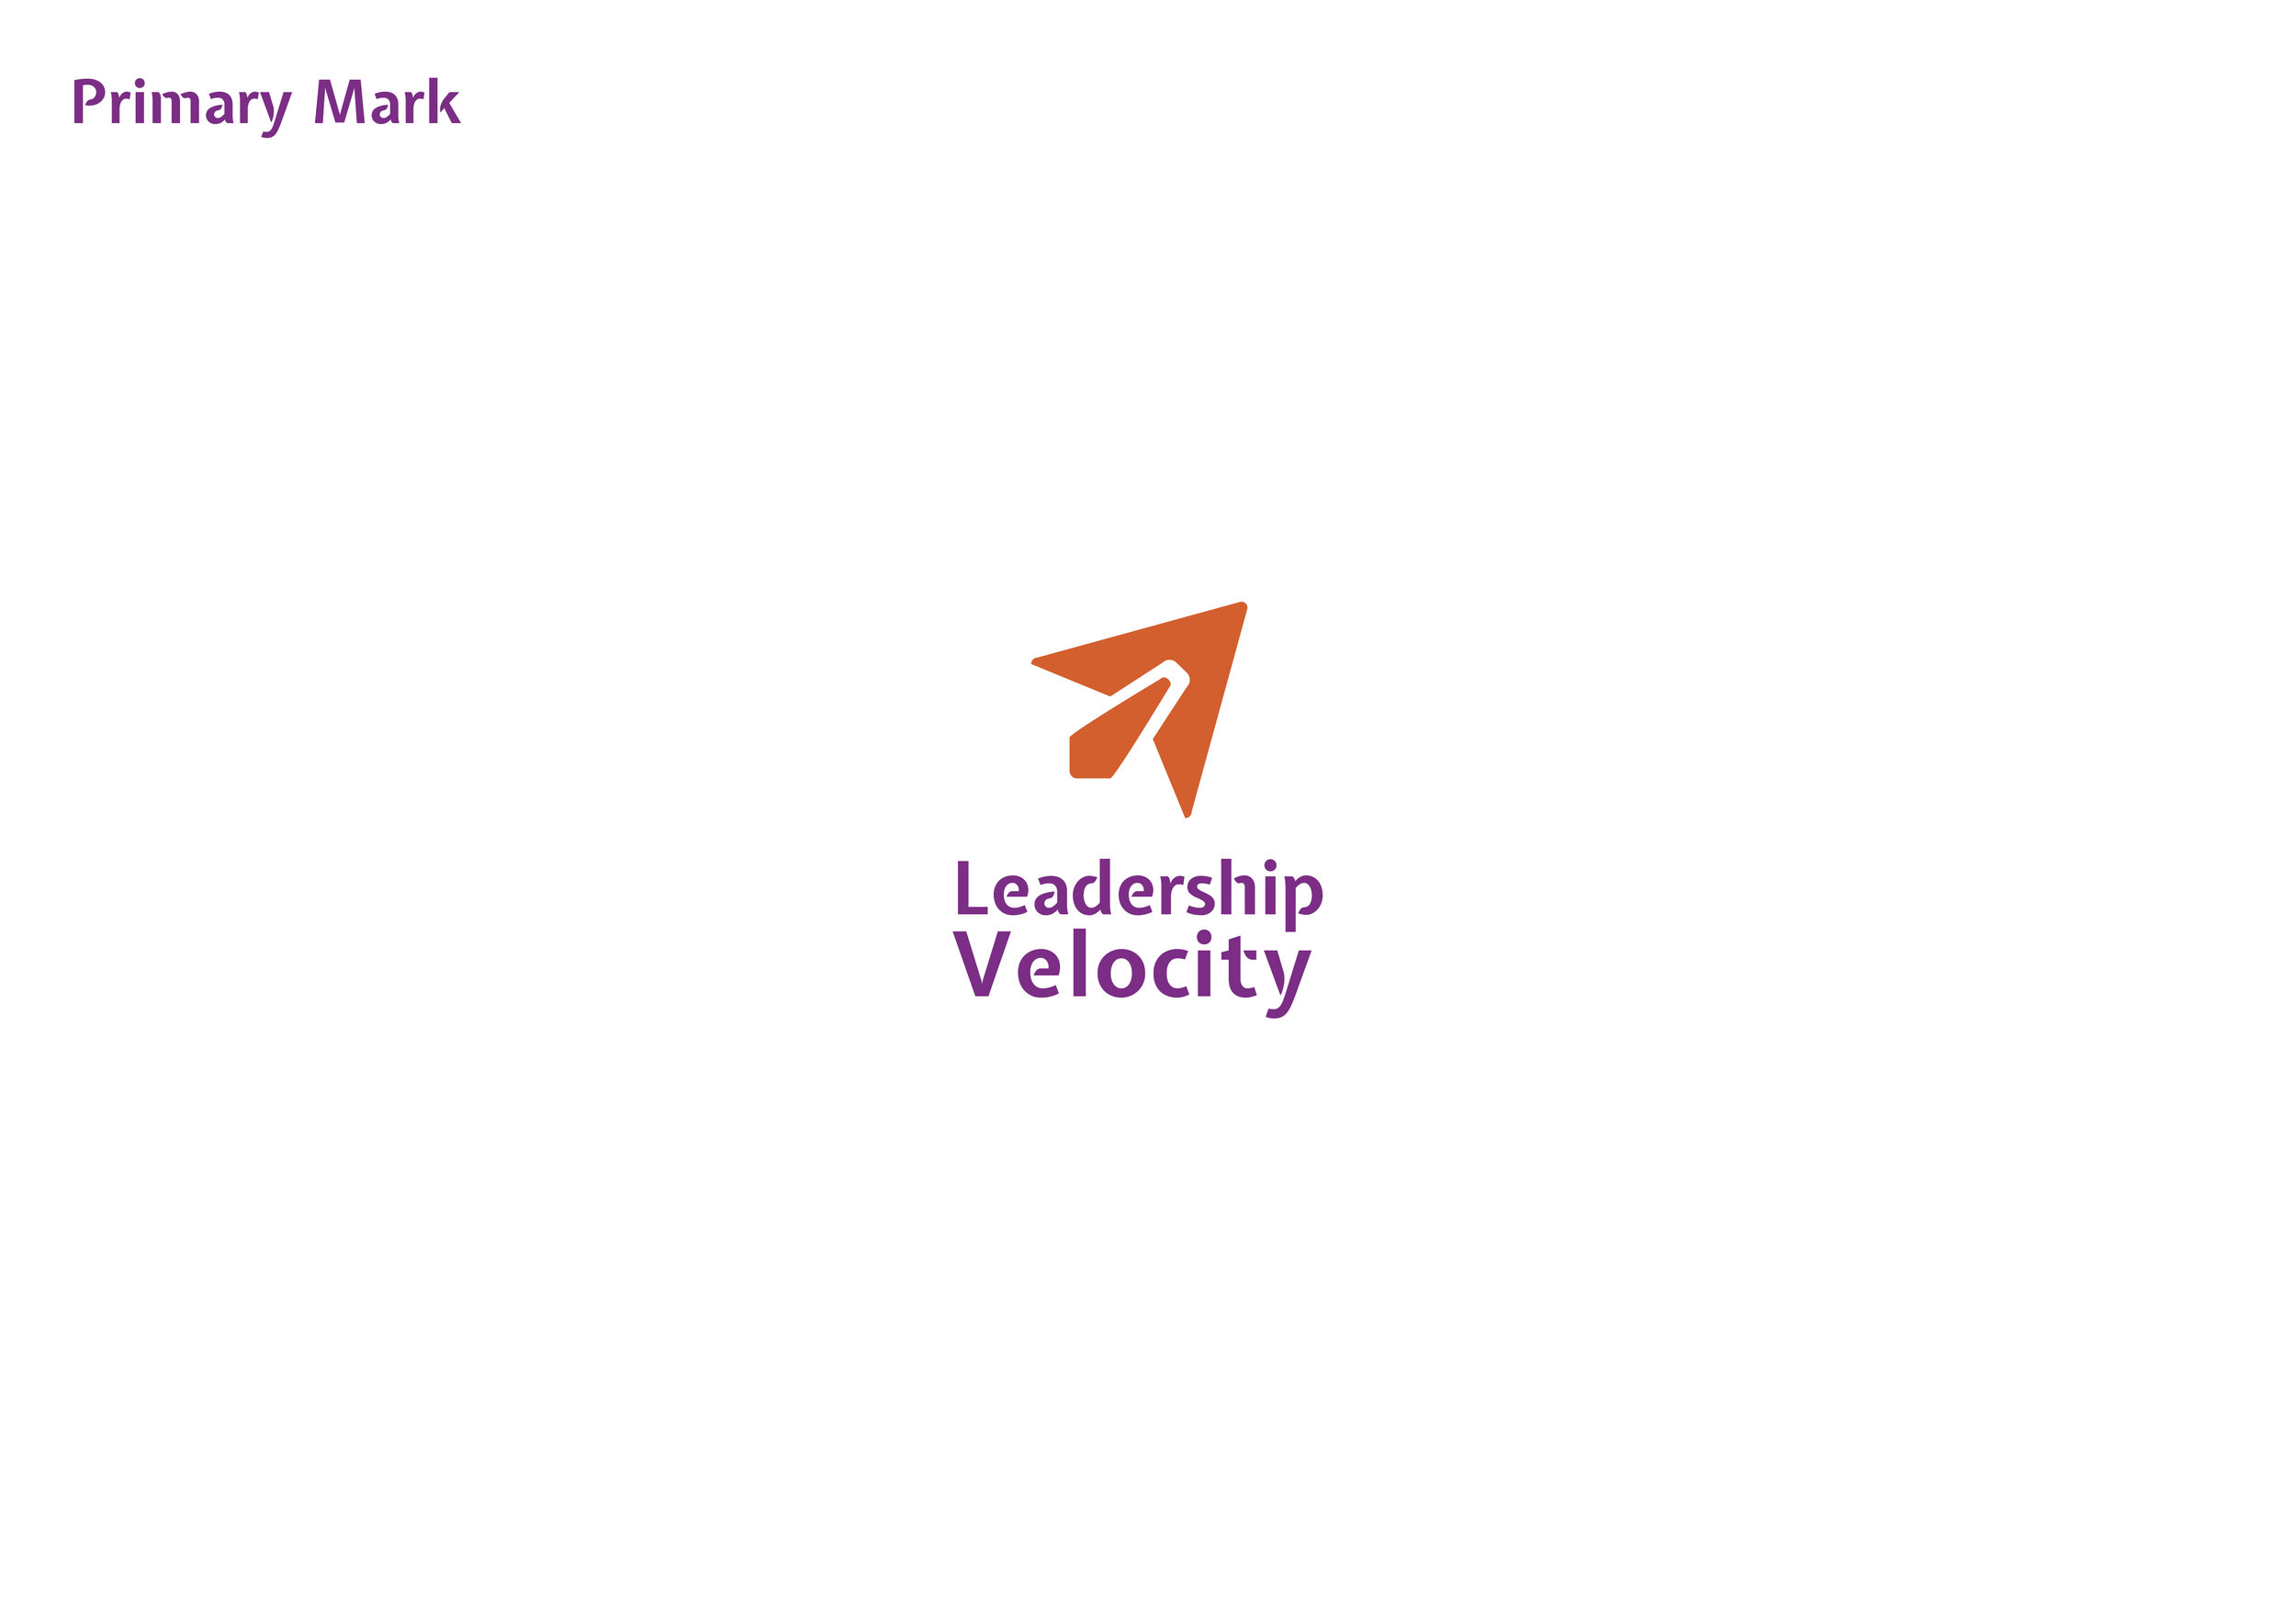 LeadershipVelocity_BrandIdentity_StyleGuide3.jpg